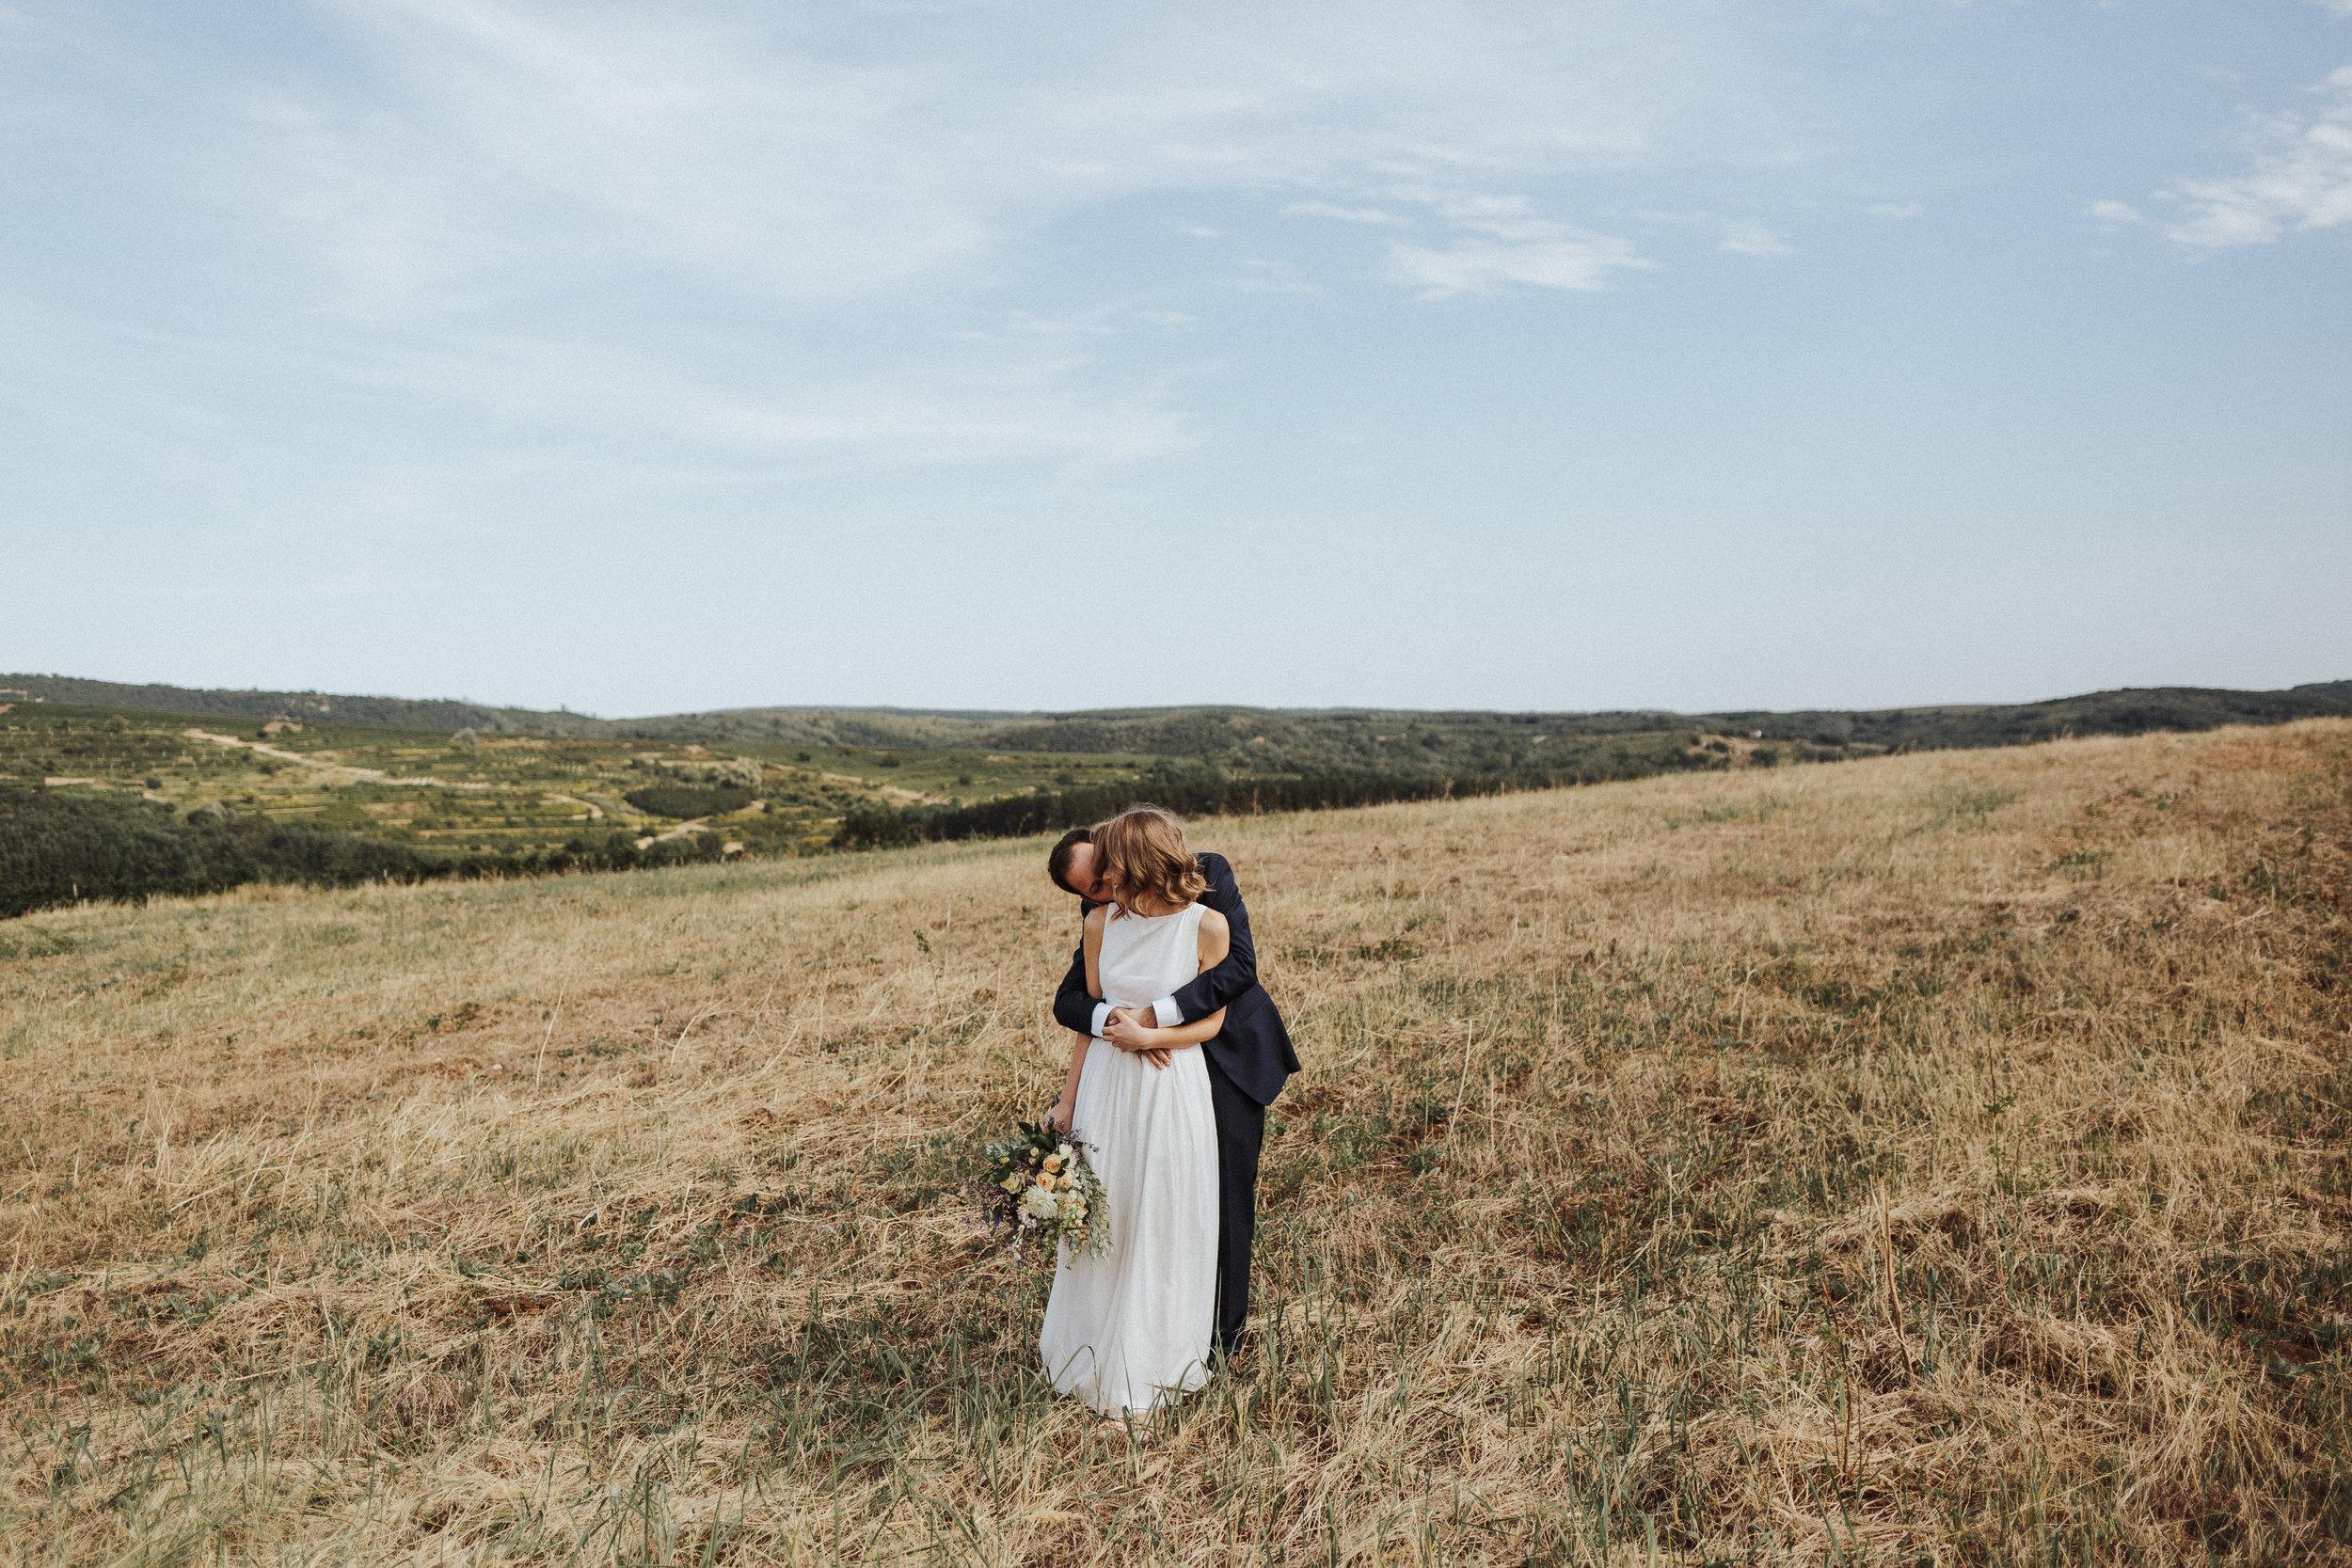 20170902_Monika+Marci_wedding_f_160__MG_5126_1.jpg